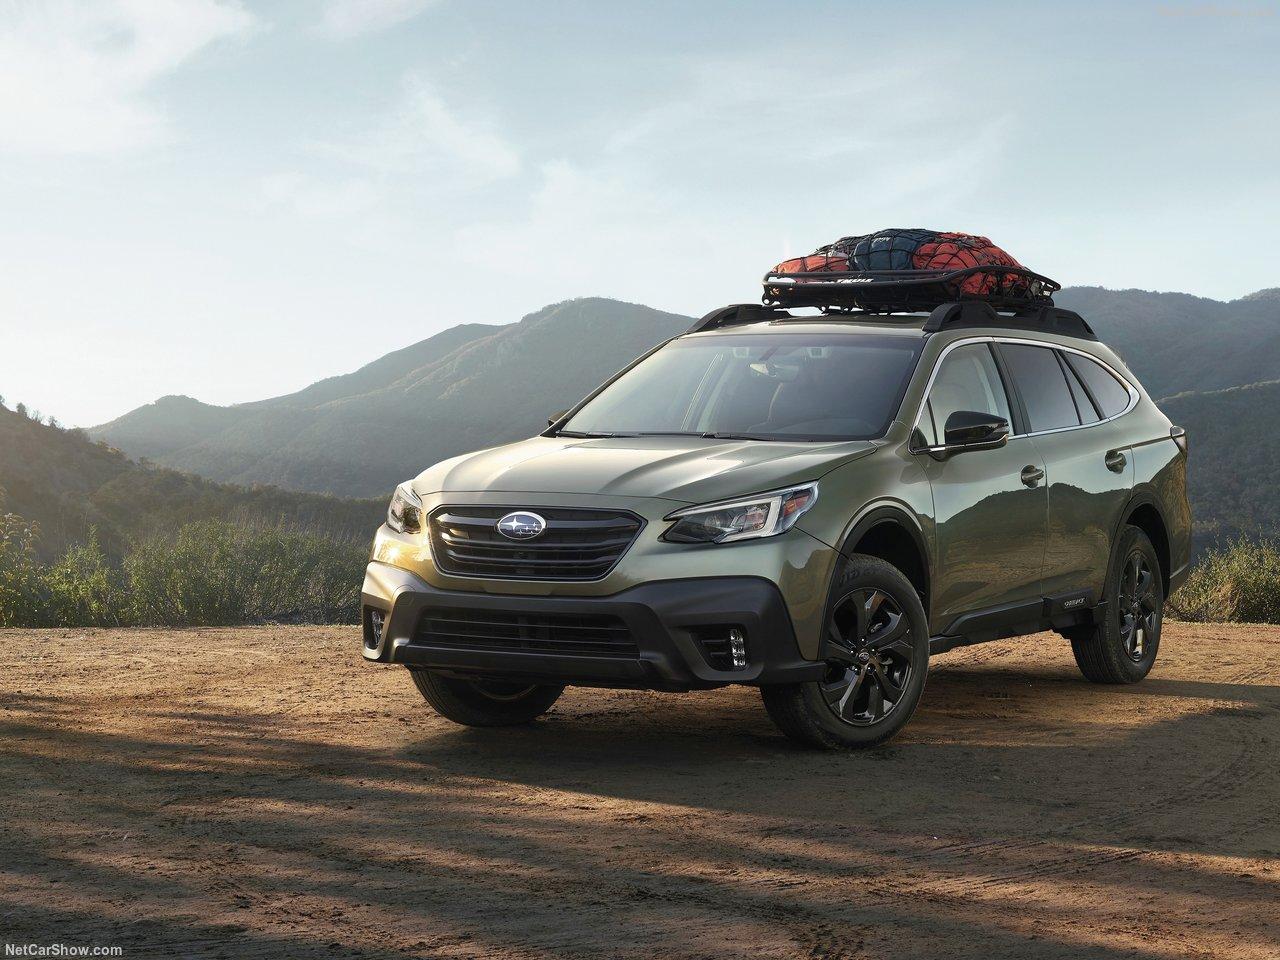 Subaru-Outback-2020-1280-02.jpg